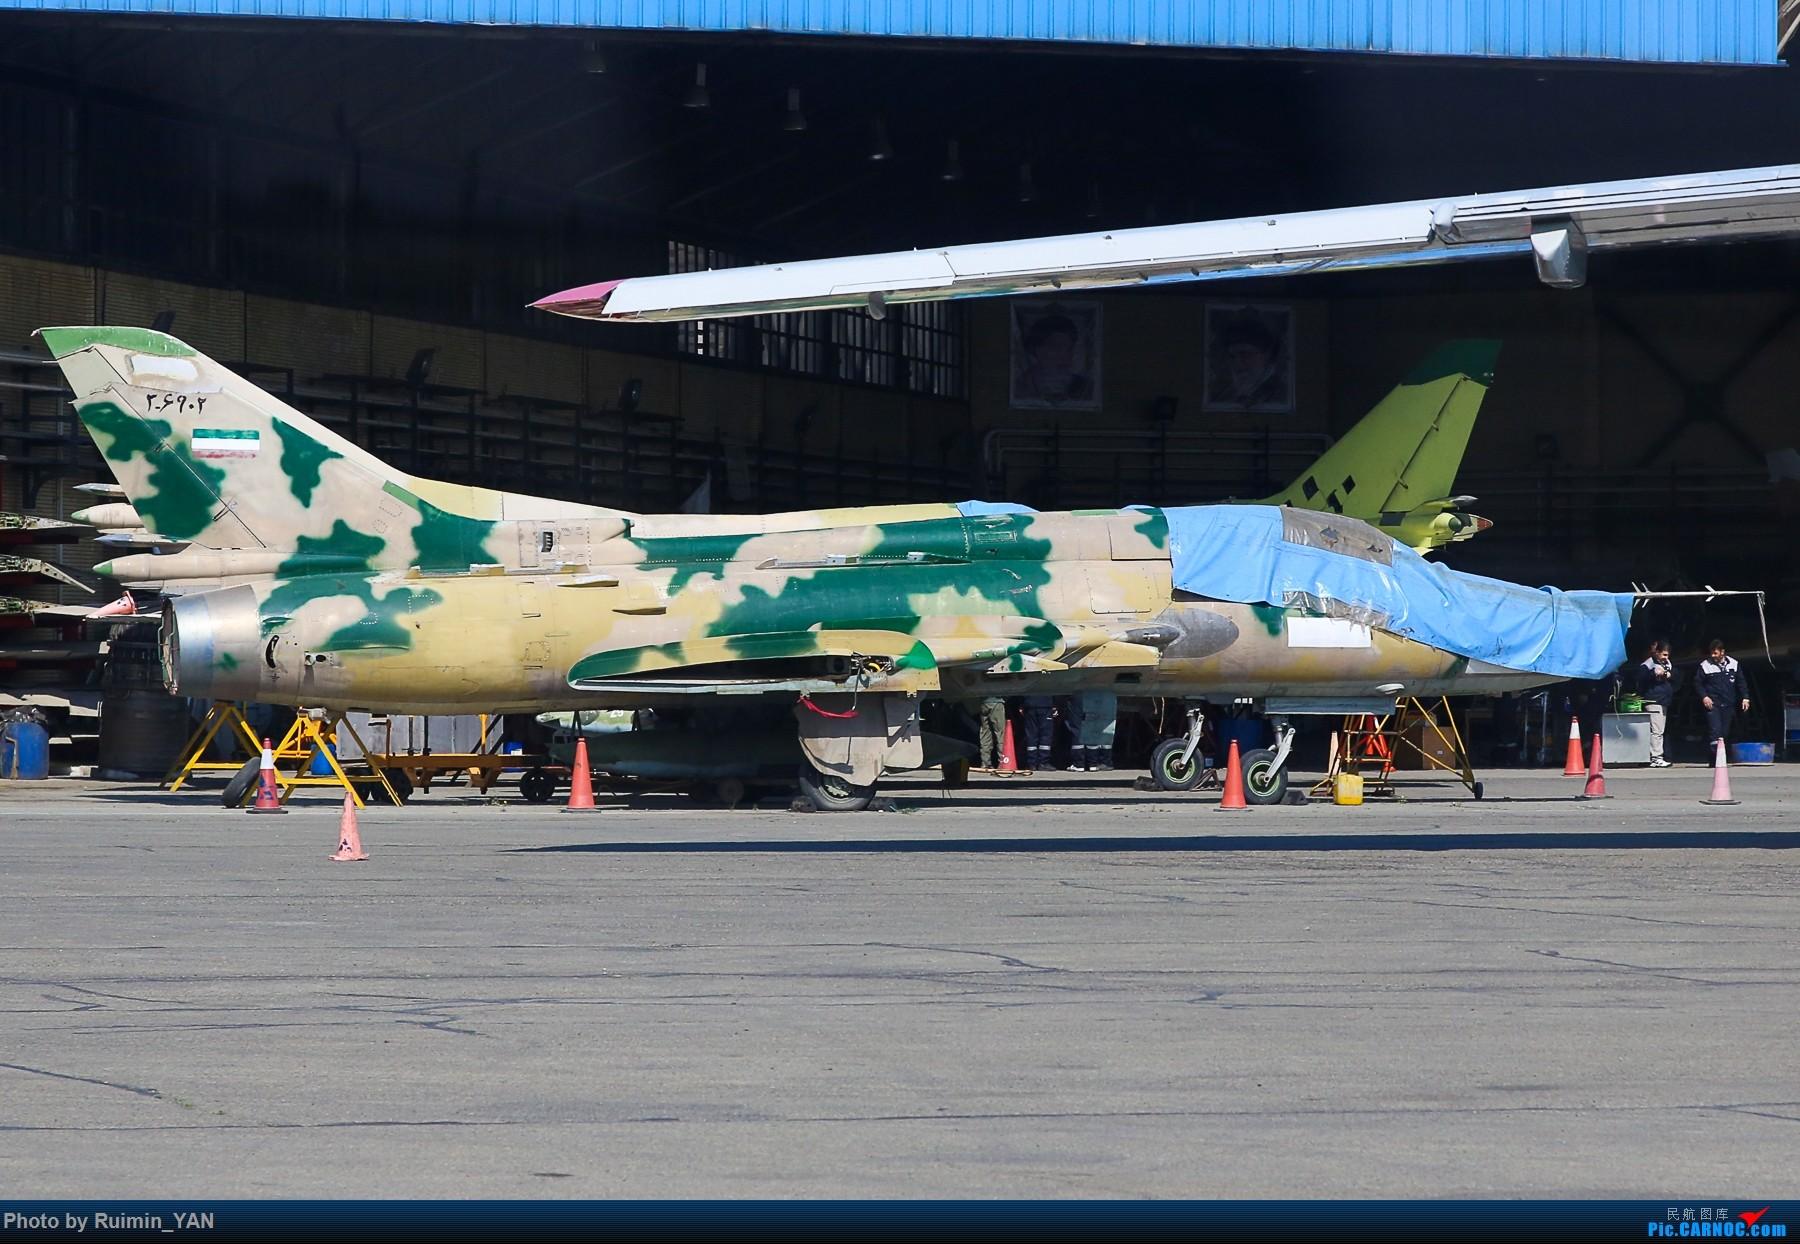 Re:[原创]【THR】(德黑兰梅赫拉巴德机场)伊朗空军(Iran Air Force)-- F-14A(Tomcat雄猫),Su-22M-4,F-4(鬼怪Phantom) SU-22M-4 3-6902 伊朗德黑兰机场